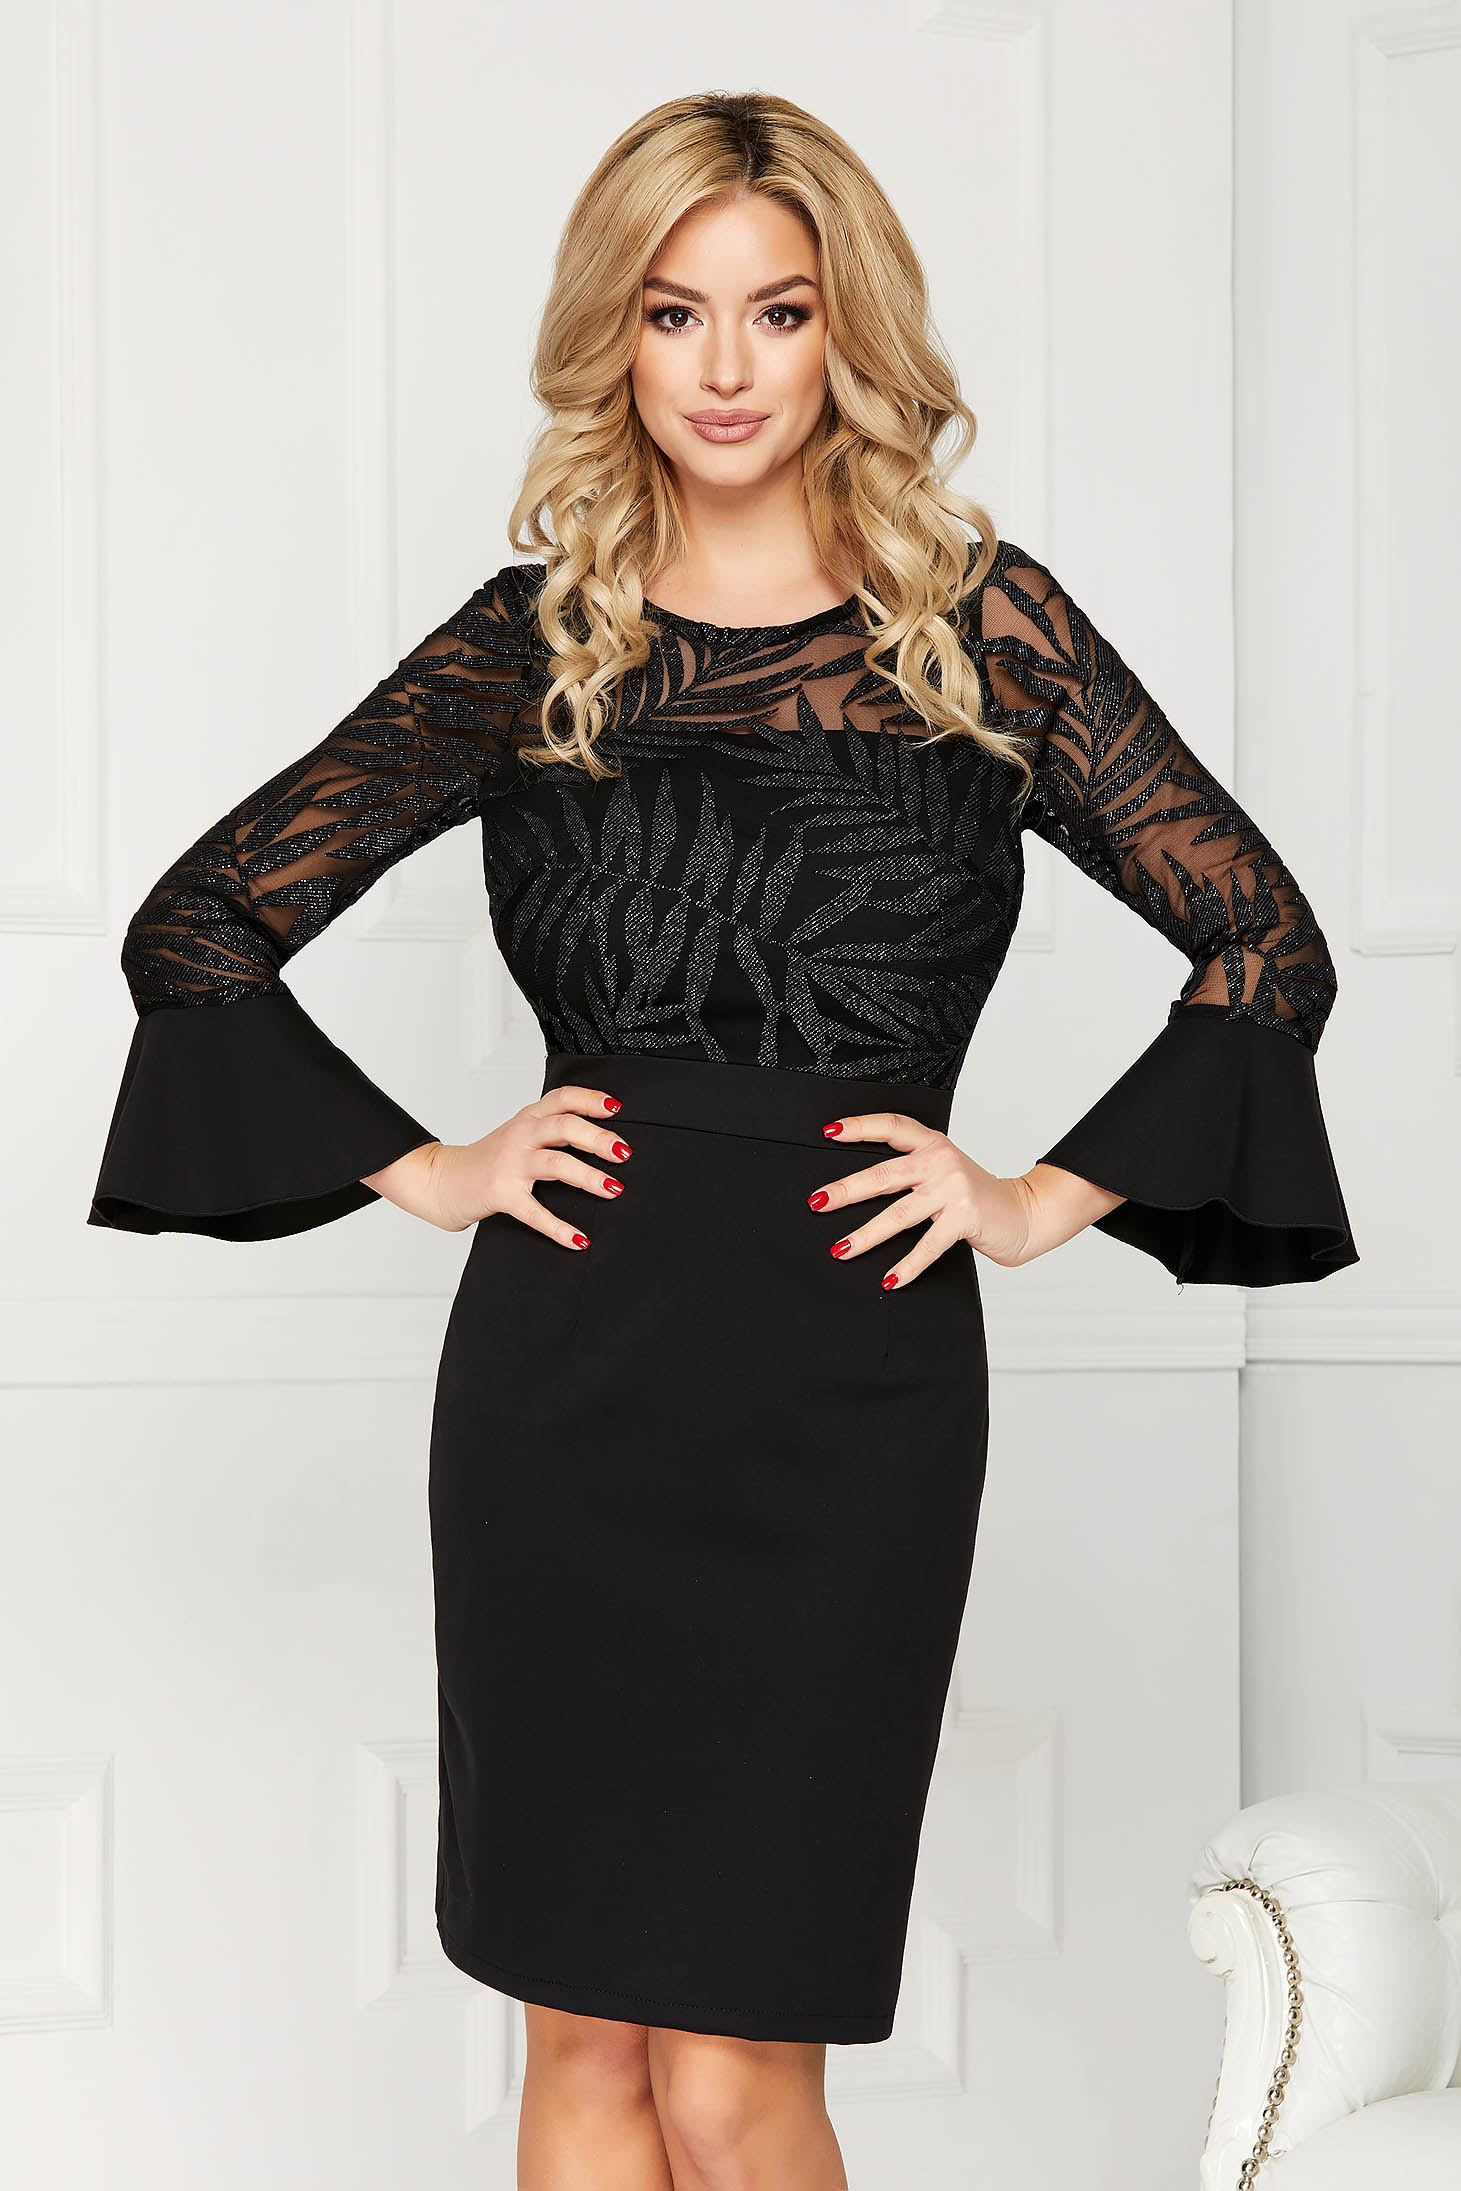 Rochie neagra eleganta scurta de ocazie tip creion din stofa cu elastic in talie si aplicatii de dantela